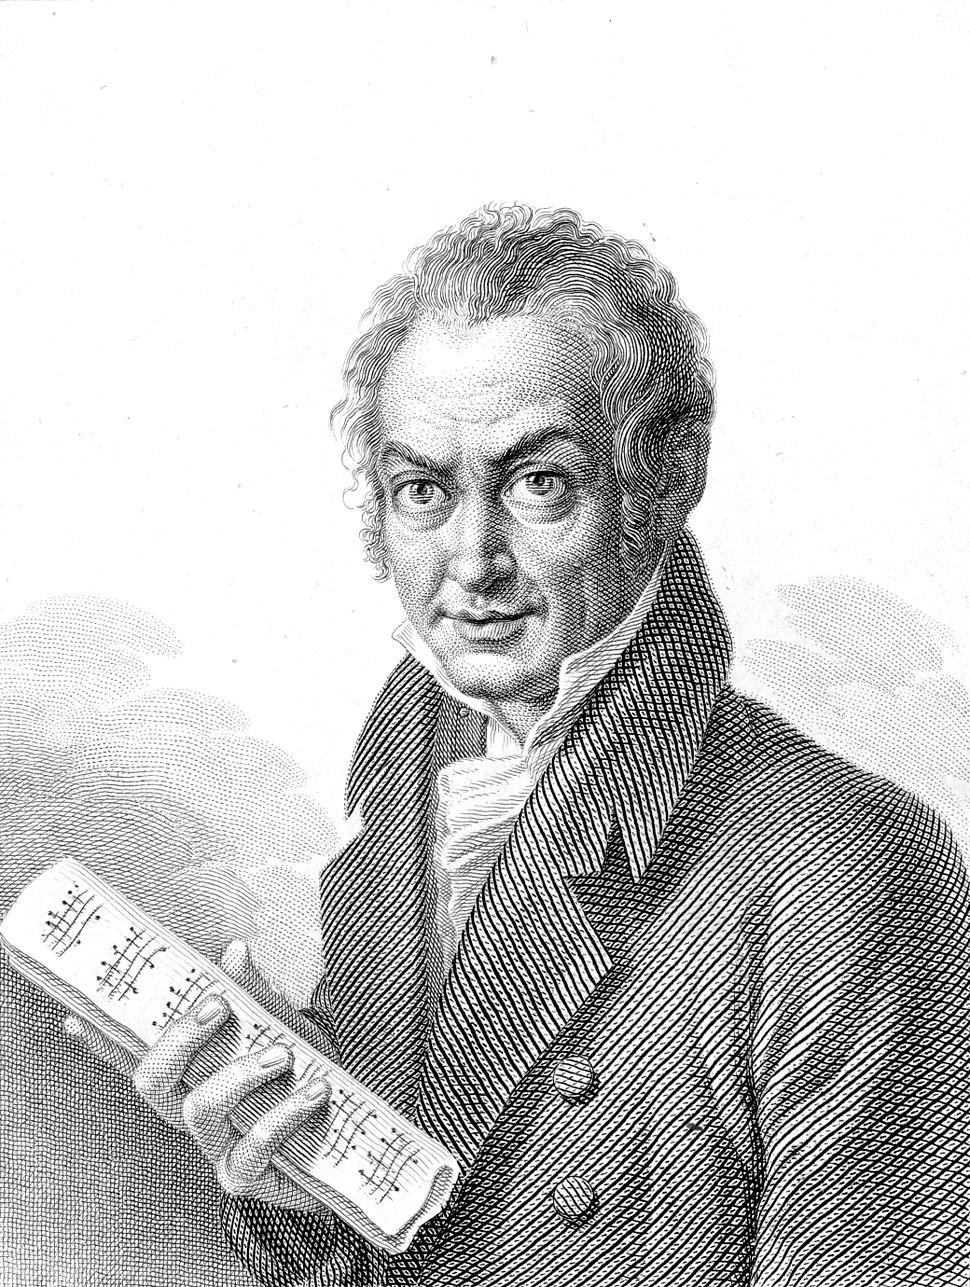 Nicola Antonio Zingarelli